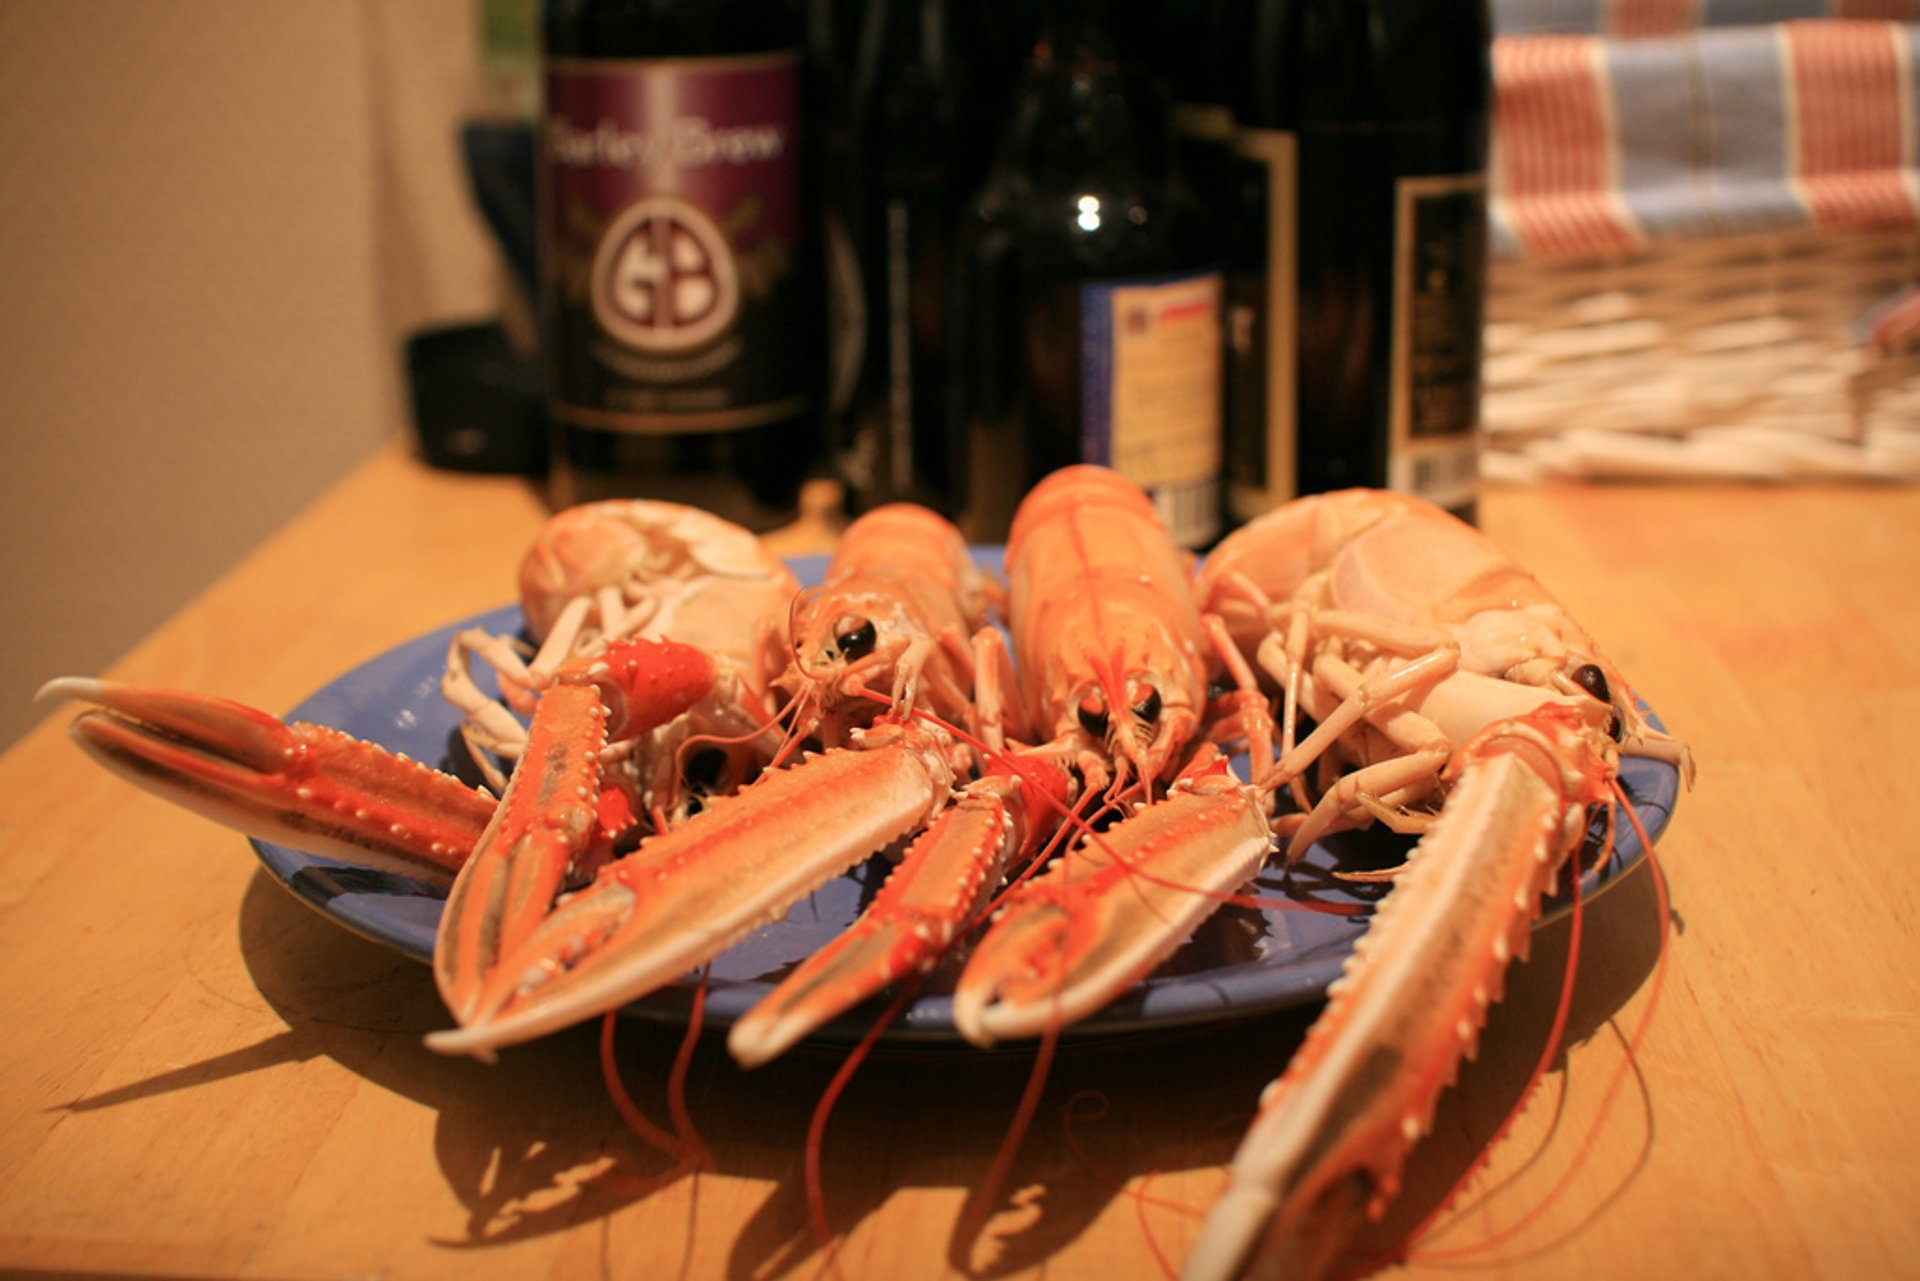 Norwegian Lobster in Norway 2020 - Best Time